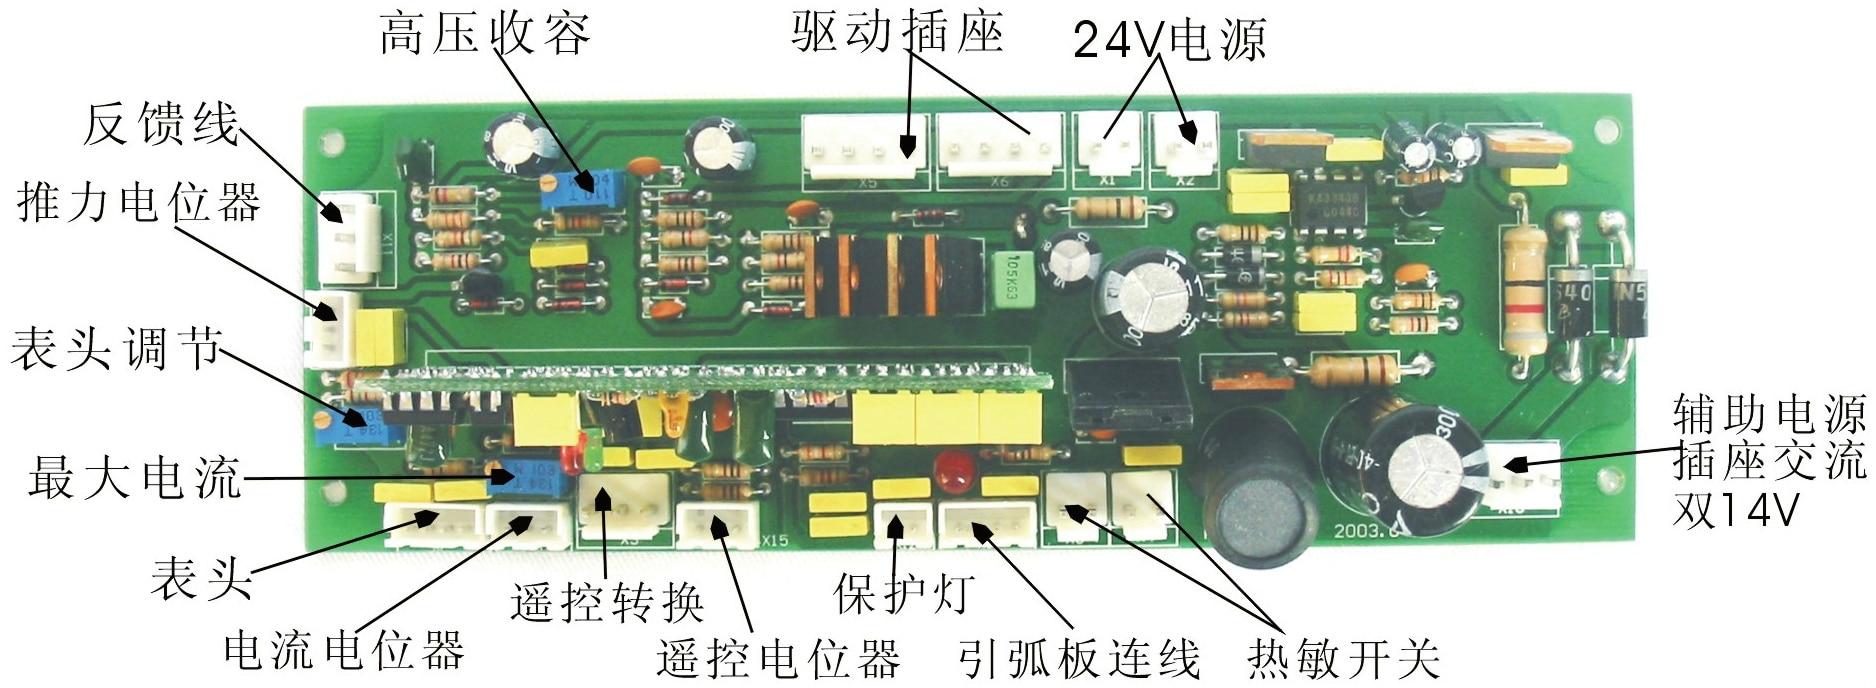 hight resolution of electric welding machine inverter dc manual welding parts zx7 mos inverter welding machine